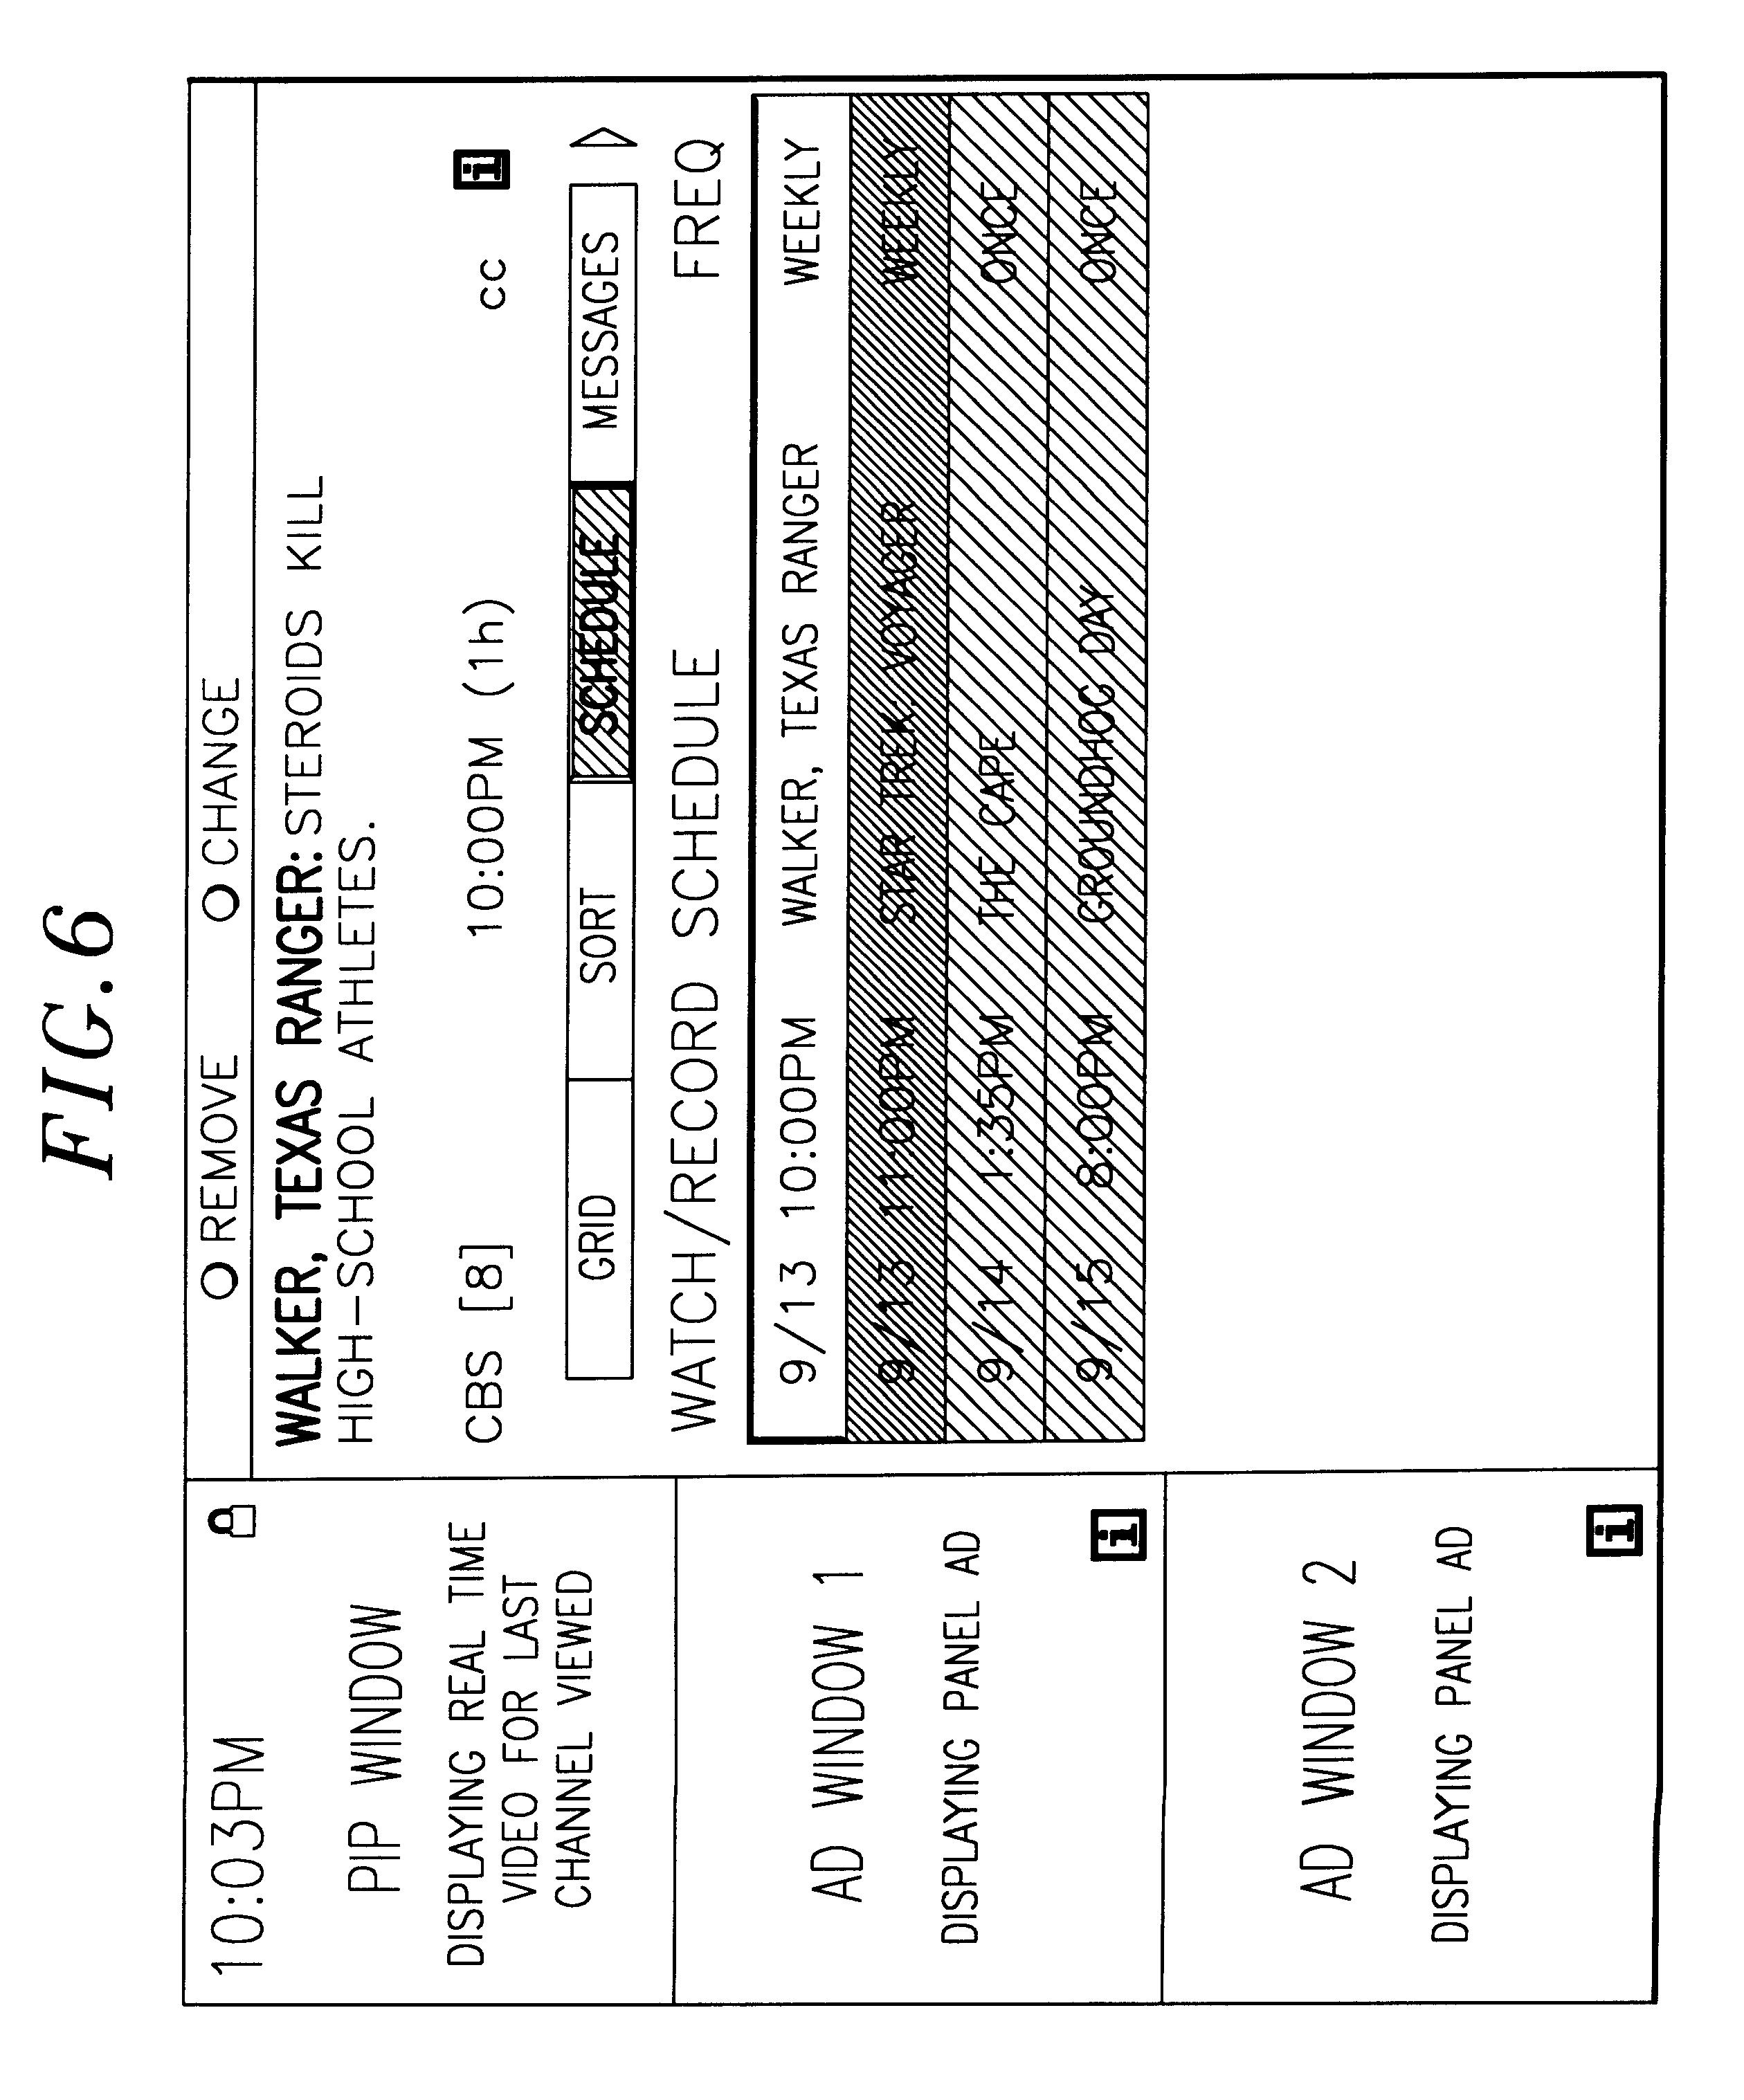 Patent US 6,177,931 B1